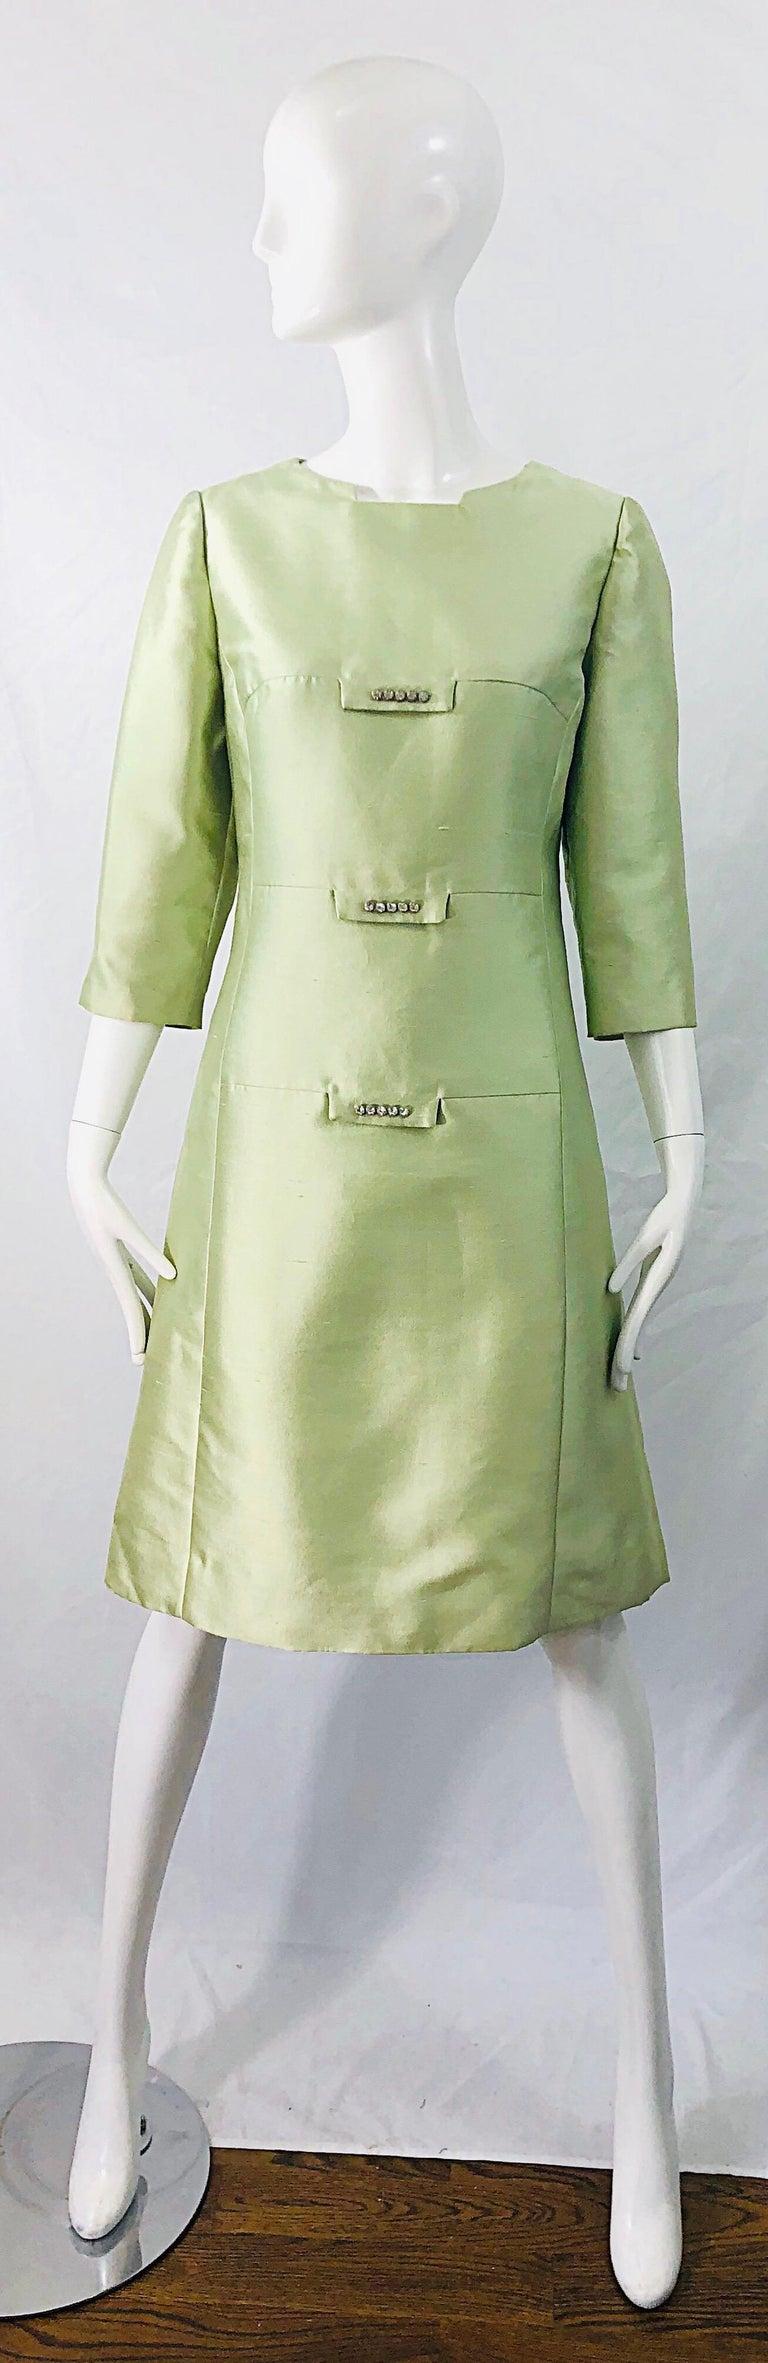 Chic 1960s Mint Green Silk Shantung Rhinestone Vintage 60s A Line Dress For Sale 8